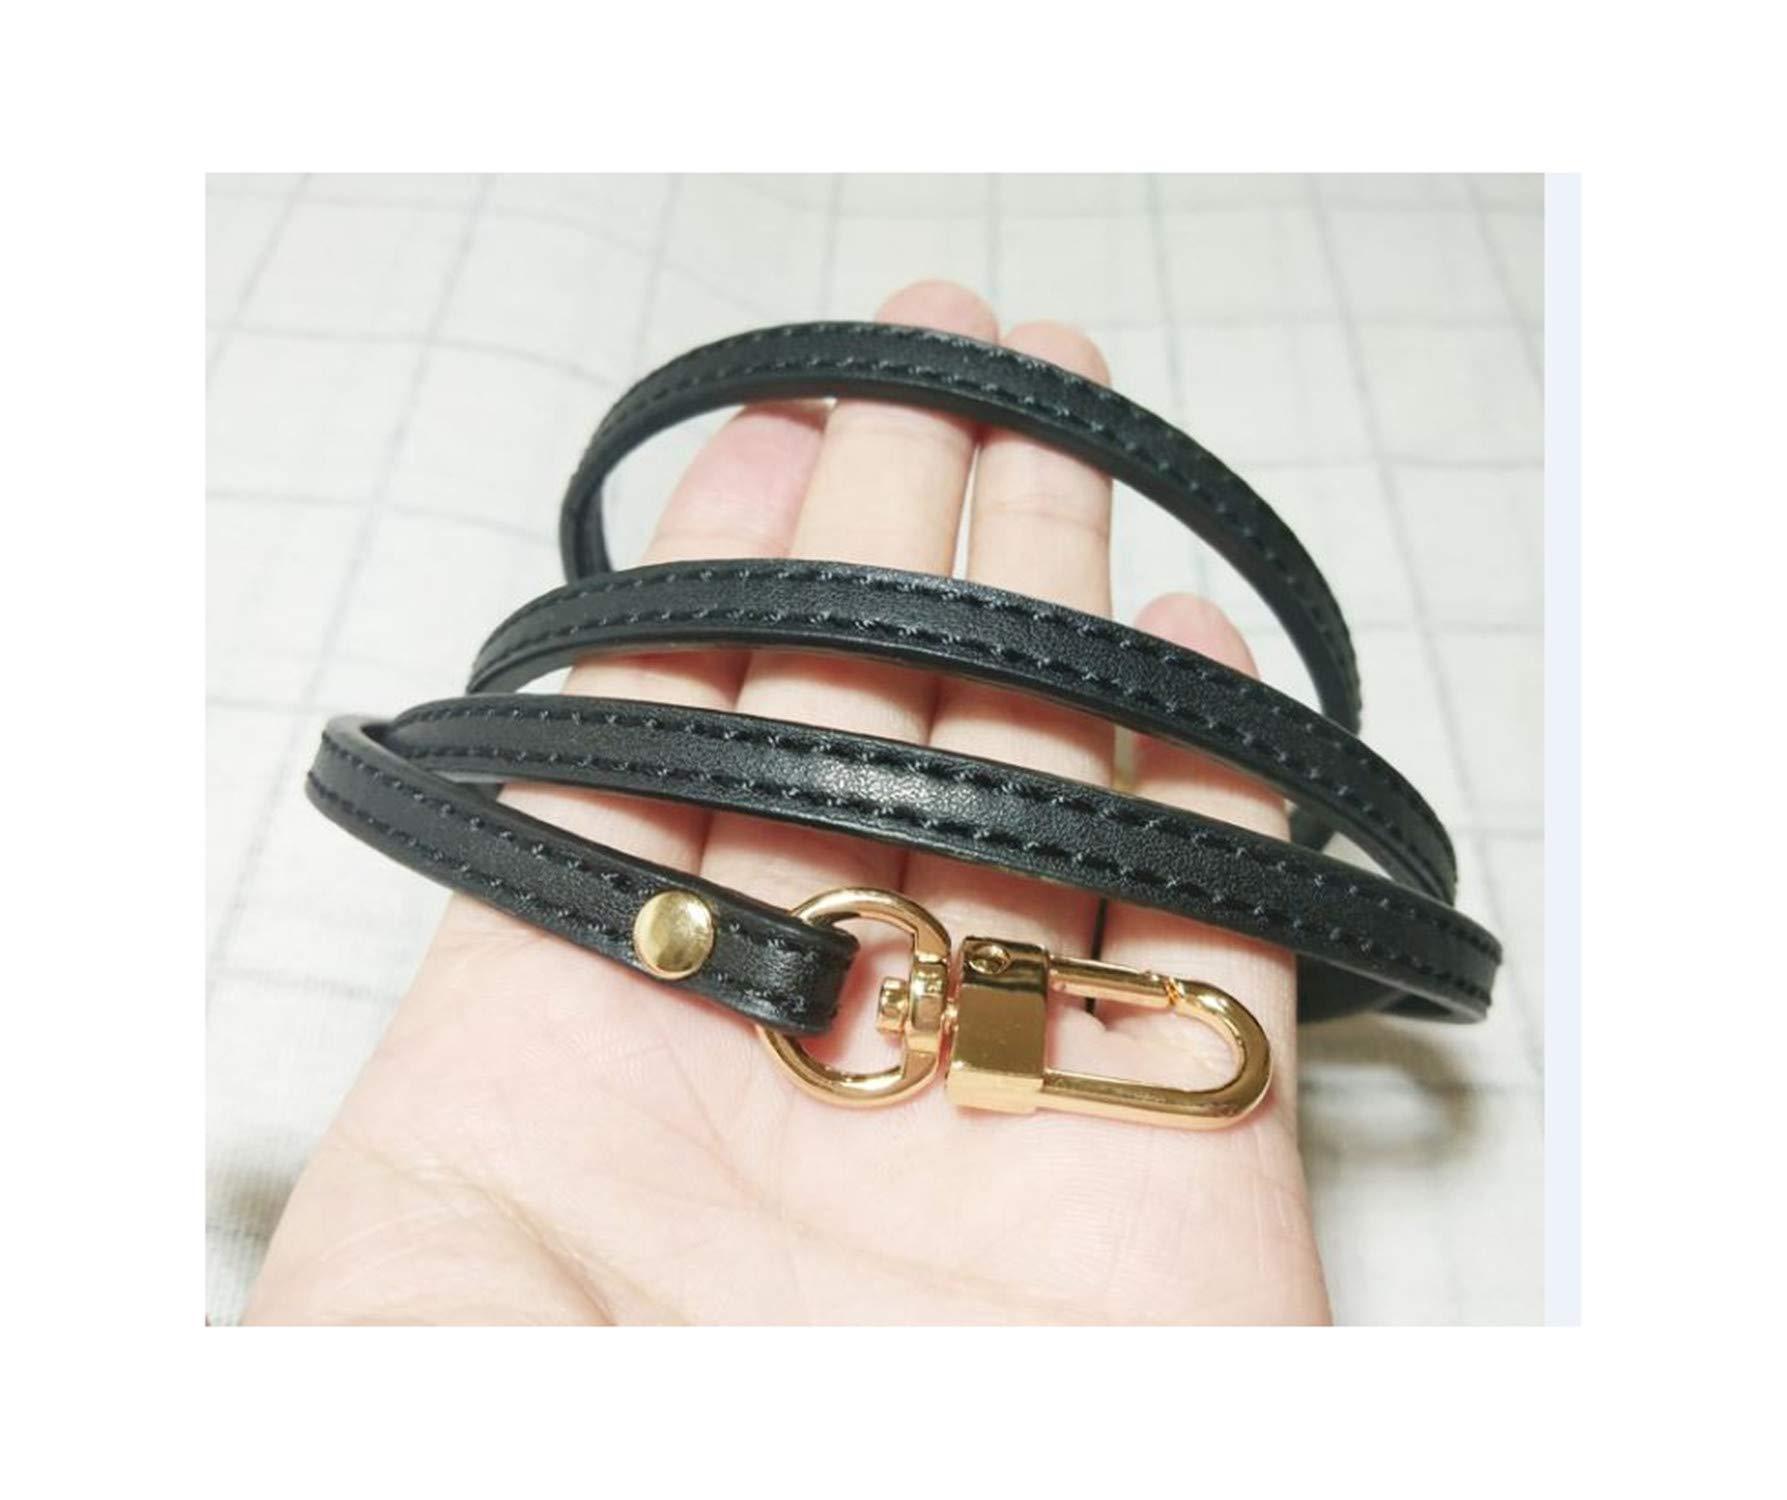 20Pcs Diy Genuine Leather Bag Strap 0.7120Cm Bag Accessories For Bag,Black,Onesize